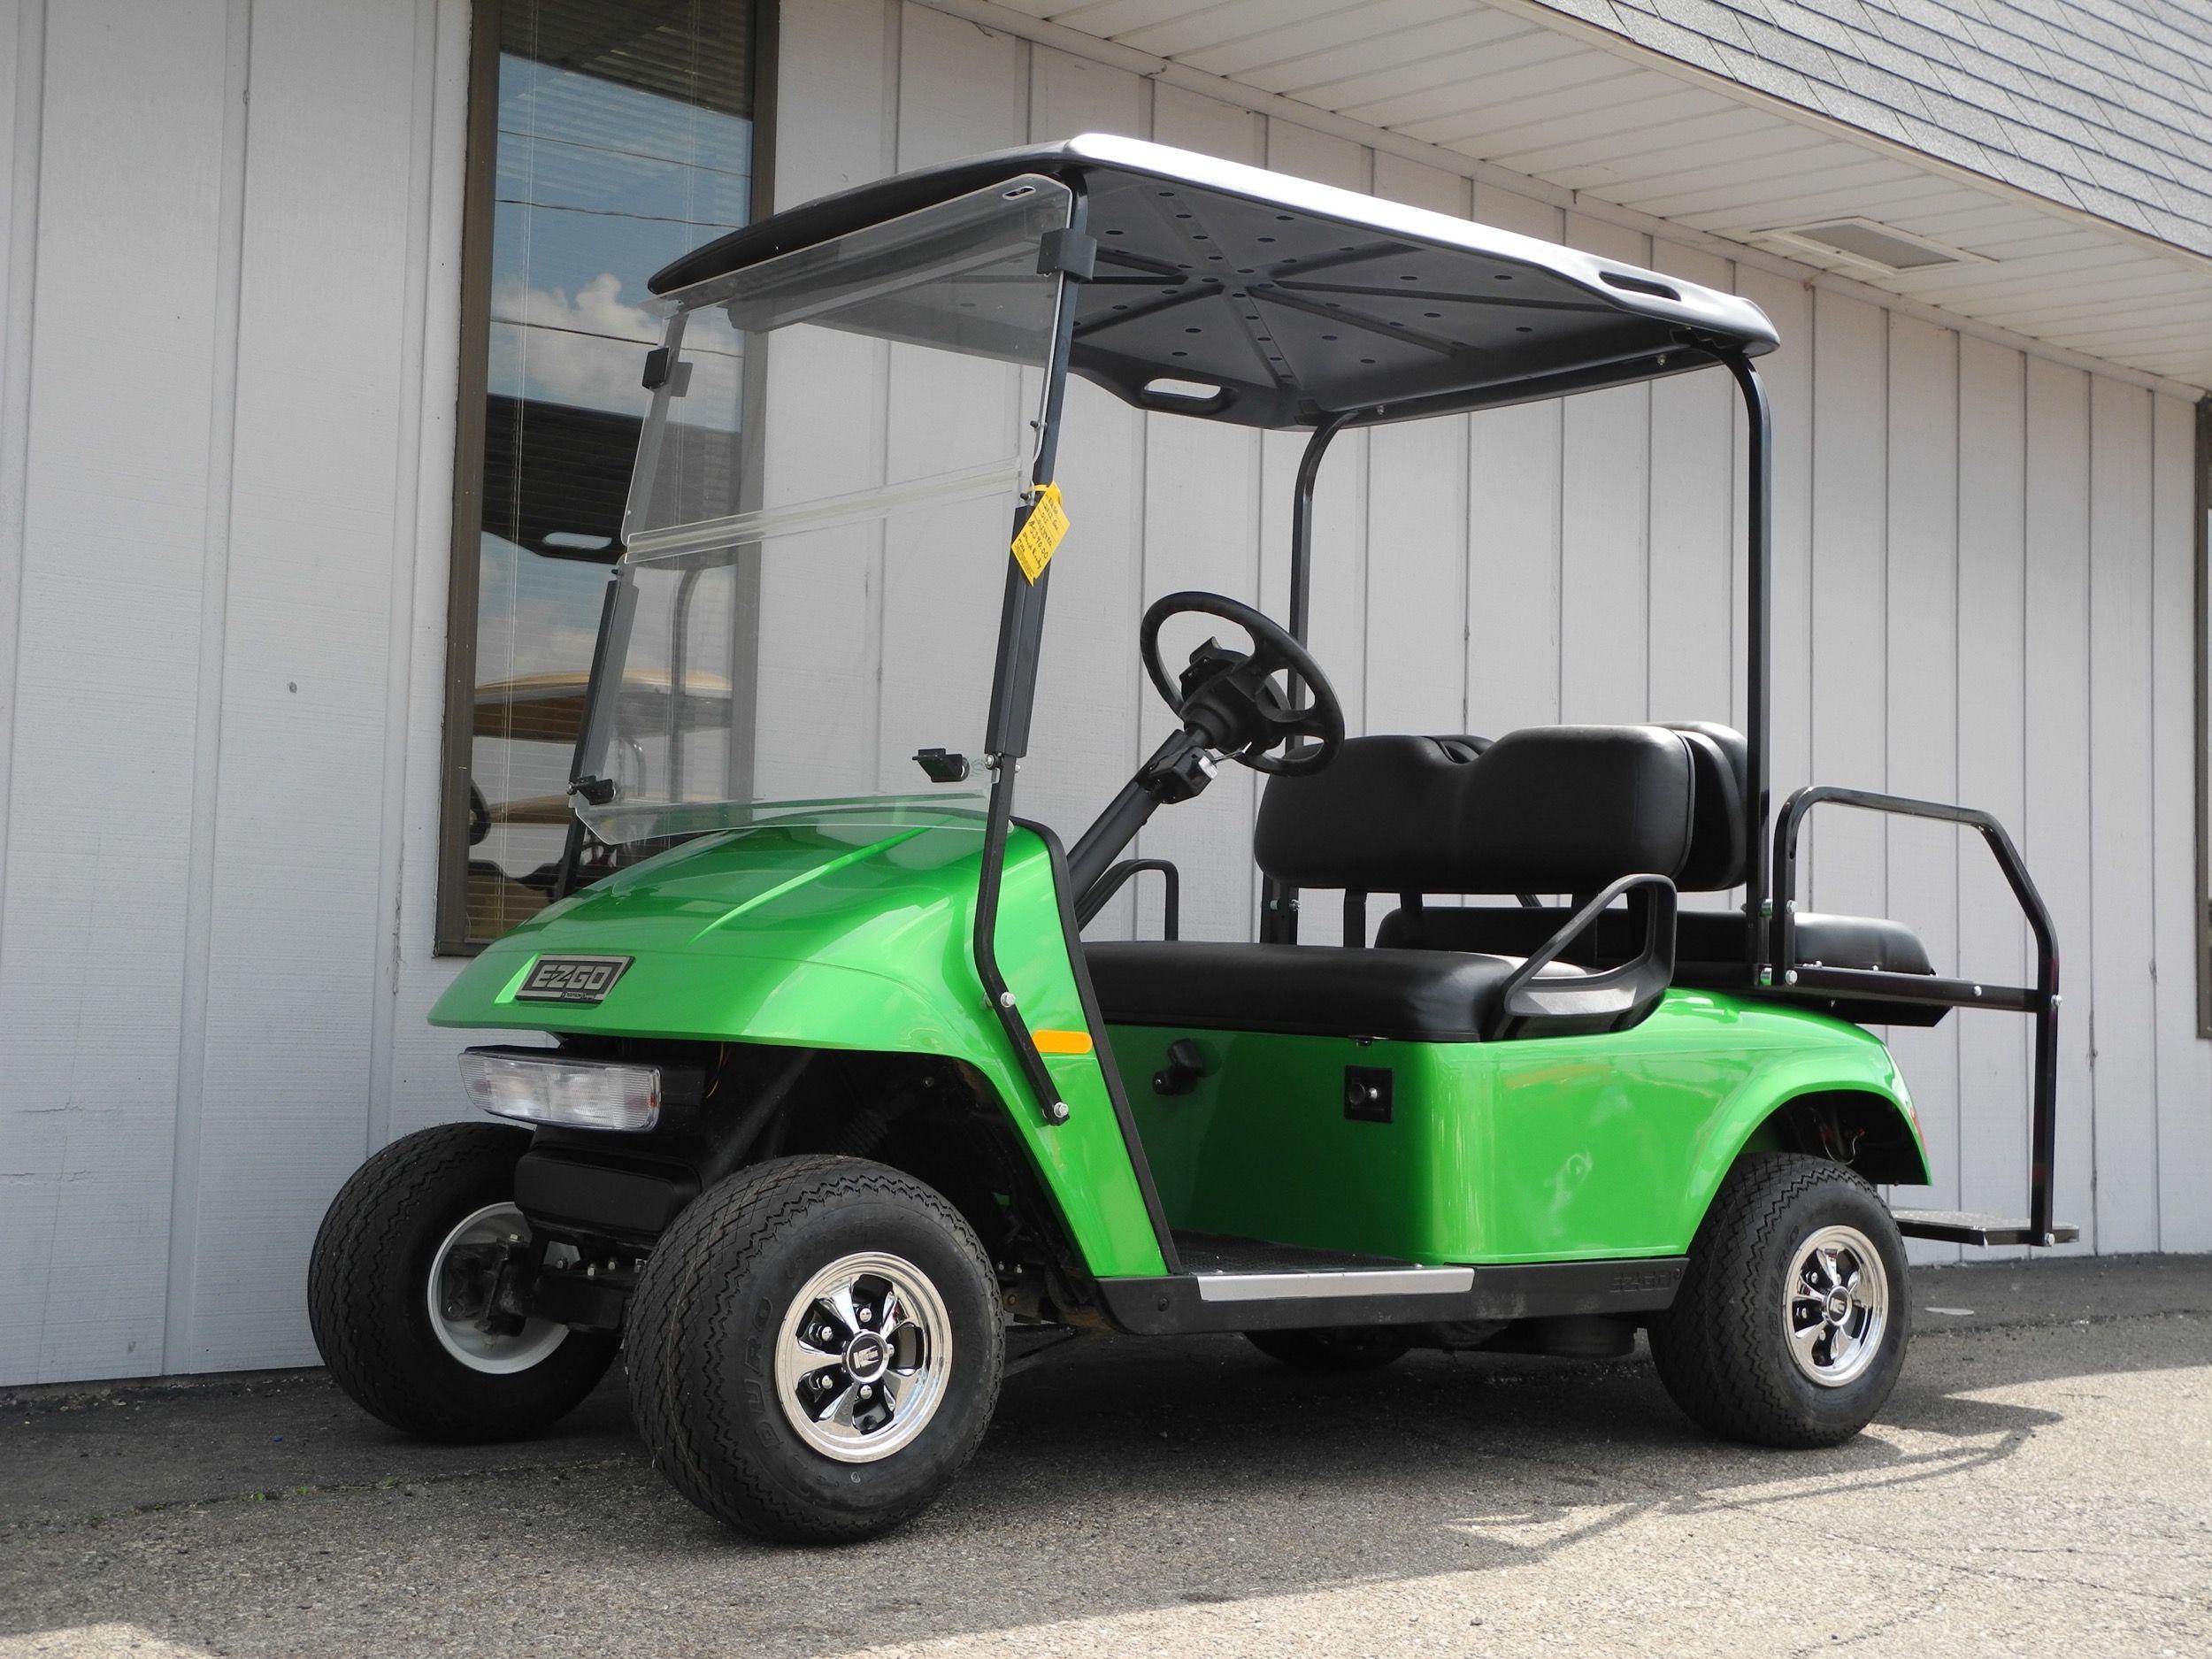 This 2013 E Z Go Gas Golf Car Is Street Ready With Headlights Tail Lights Brake Lights Turn Signals Folding Windshield Car Golf Car Street Legal Golf Cart